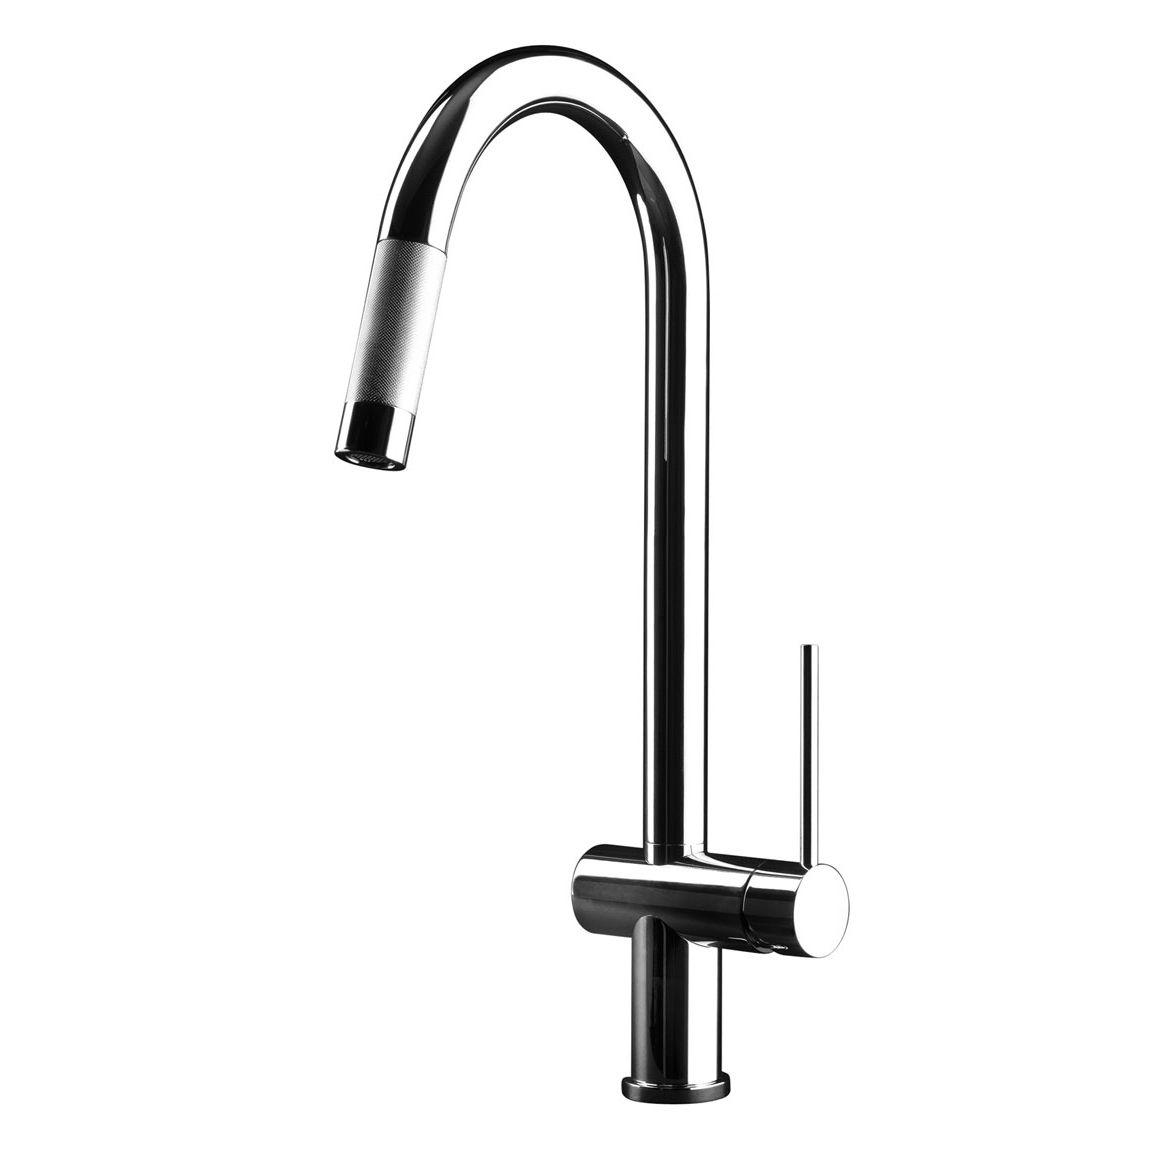 White Monobloc Kitchen Taps Oxygene Monobloc Kitchen Tap With Pull Out Spray Sinks Tapscom